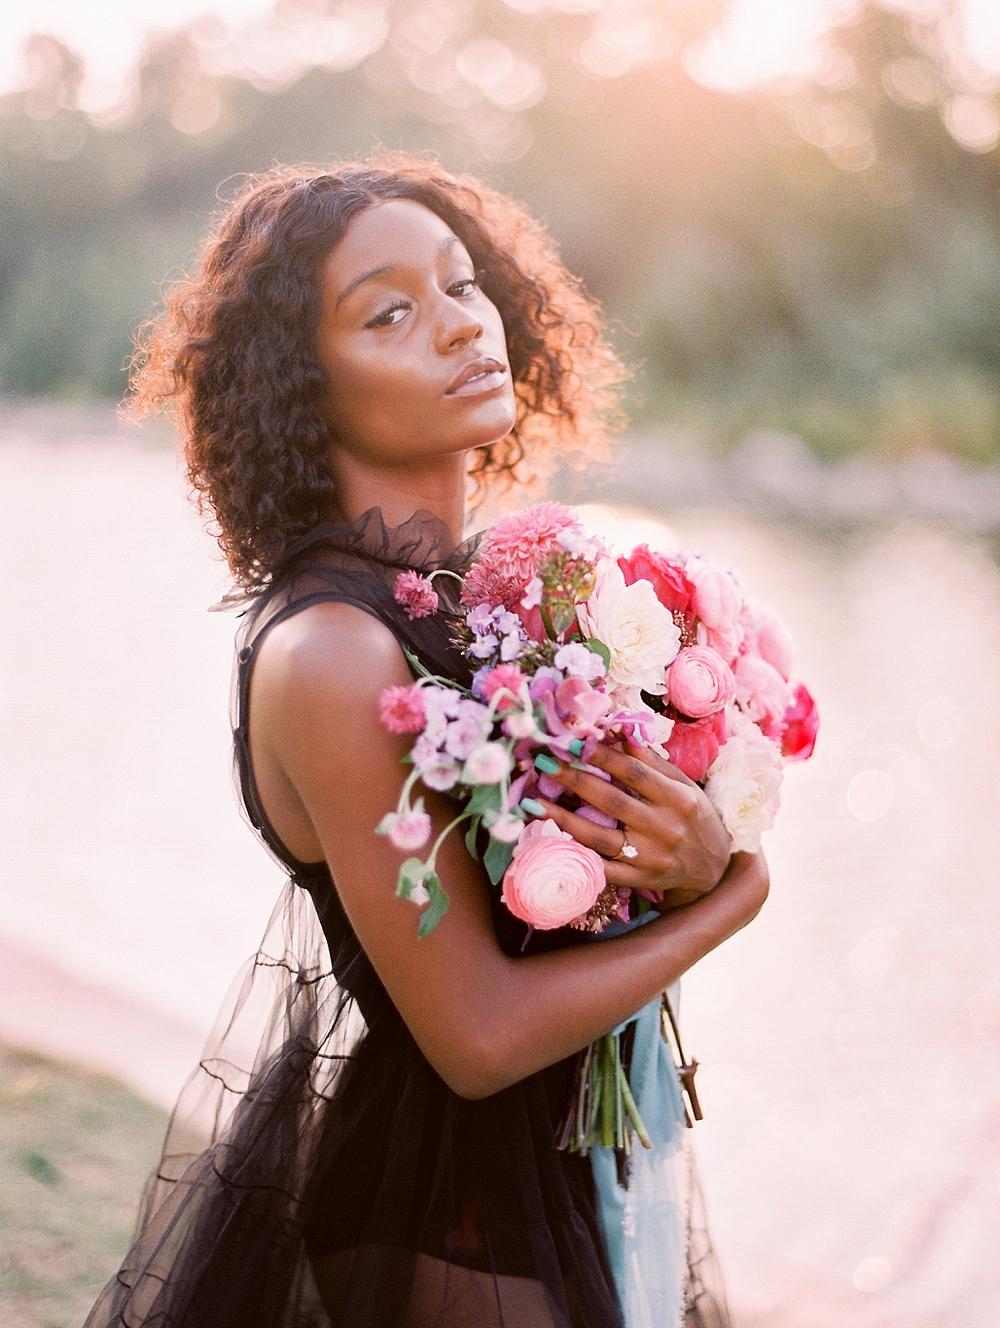 kristin-la-voie-photography-AUSTIN-wedding-BOUDOIR-photographer-137